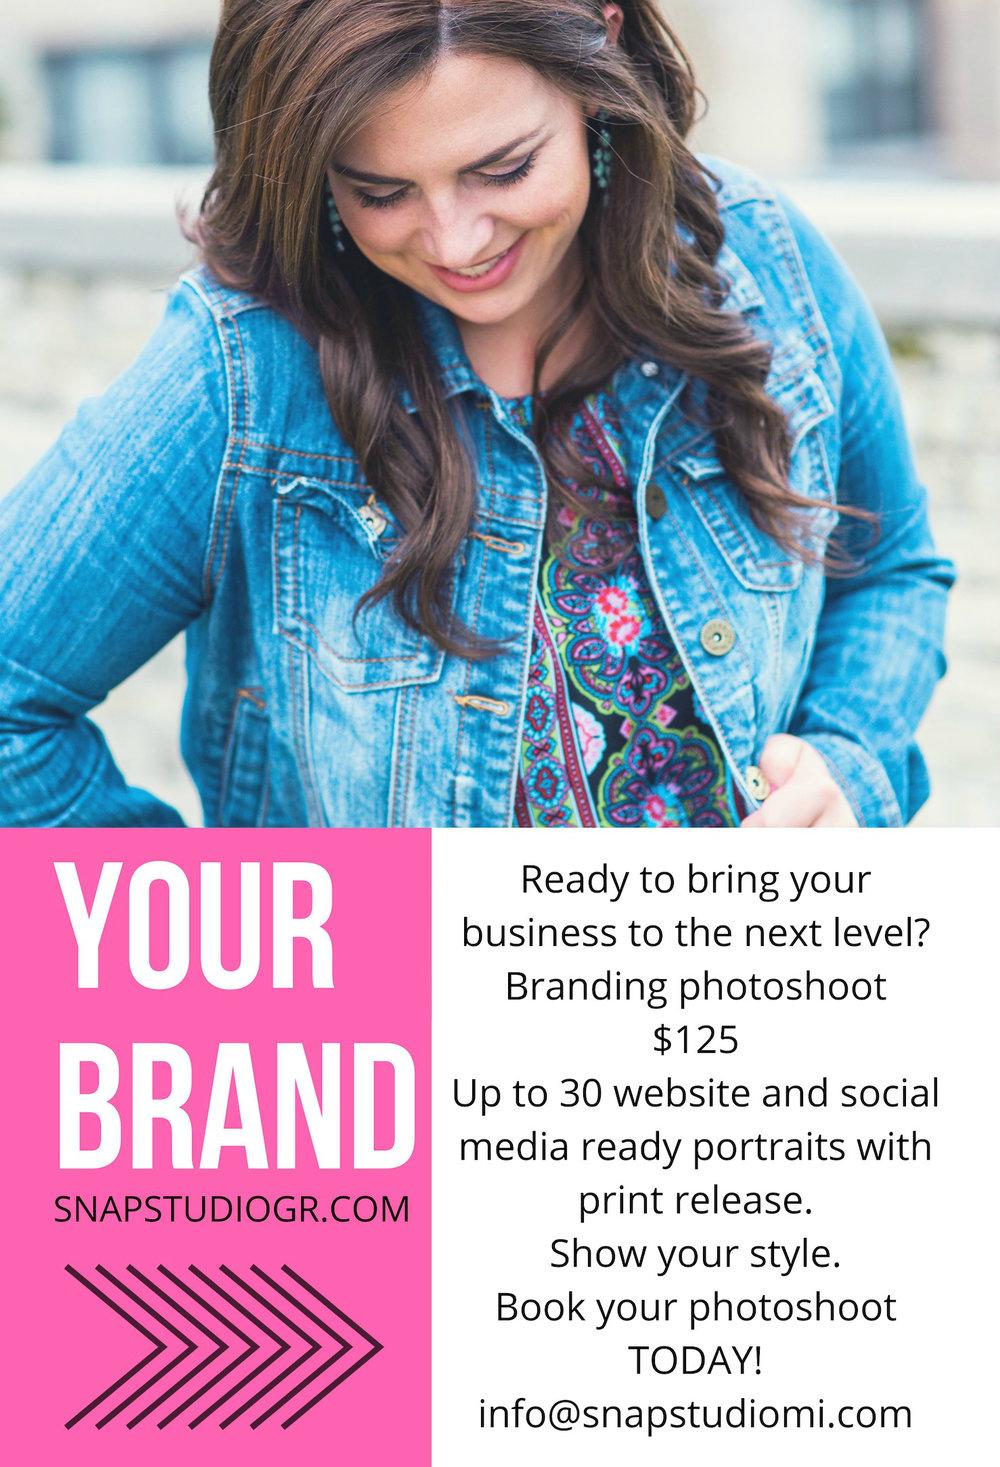 Grand-Rapids-Wedding-Event-Photographer-Videographer-Women-in-business